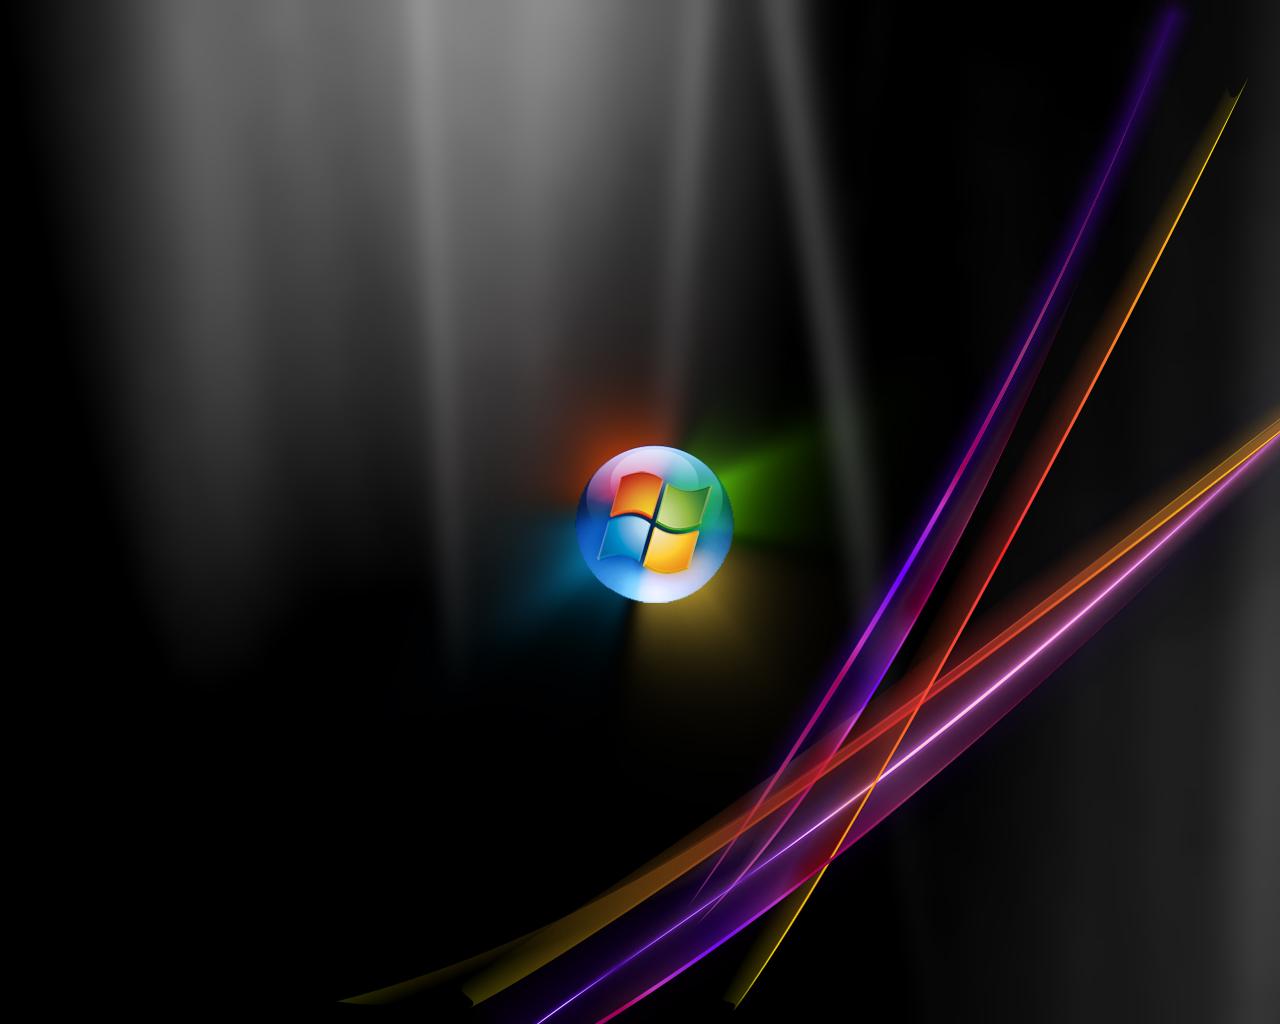 http://3.bp.blogspot.com/-icGZRyvzHTE/TtzUUAkwW2I/AAAAAAAABLU/fN_uoIOcHS4/s1600/windows-vista-13-719926.jpg